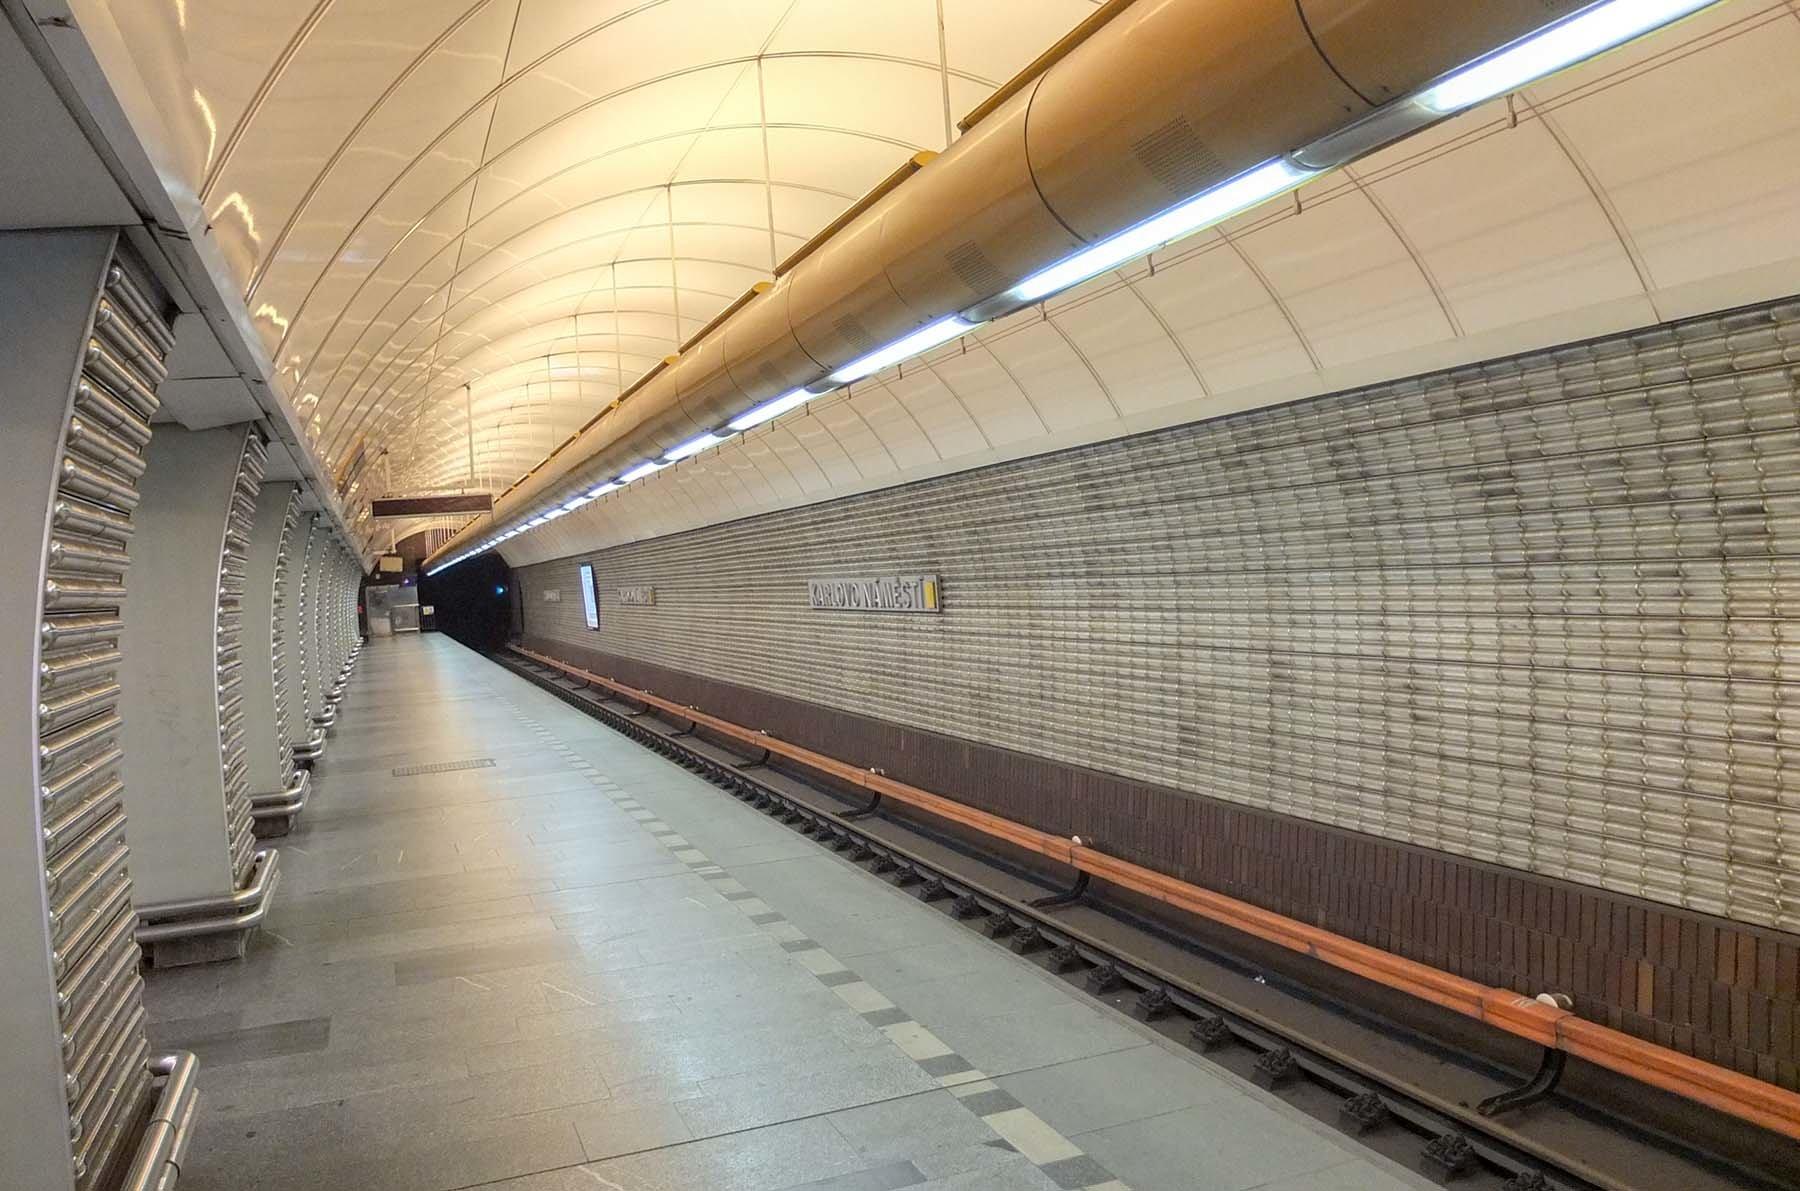 Peron stacji metra Karlove Namesti w Pradze